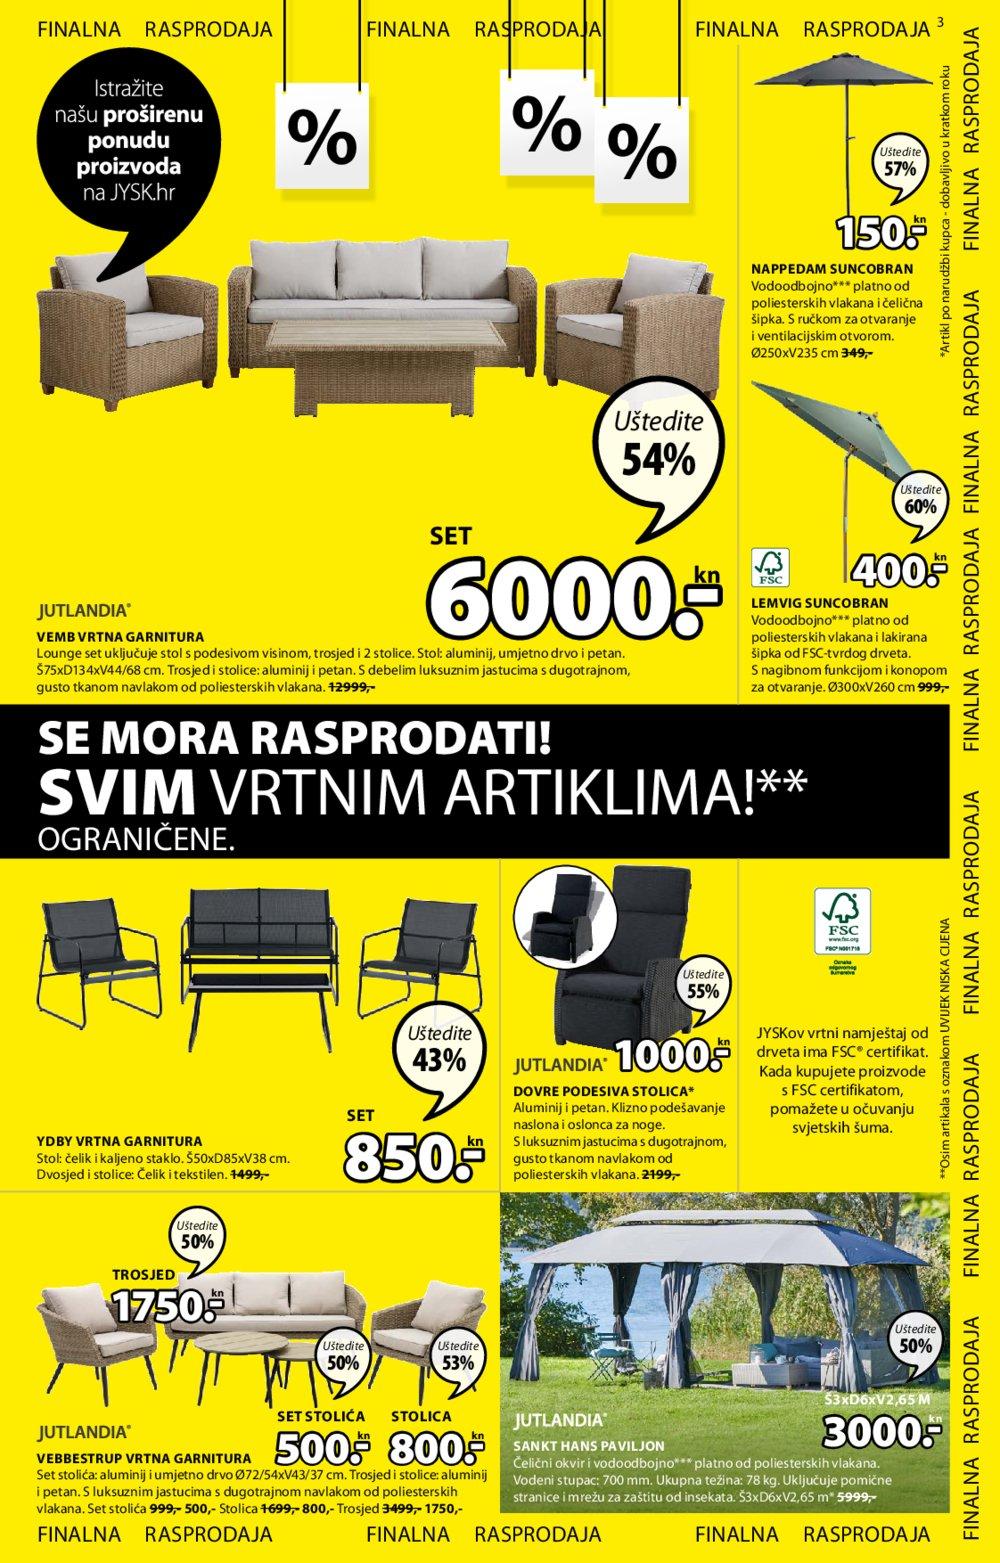 Jysk katalog Finalna rasprodaja 30.07.-12.08.2020.